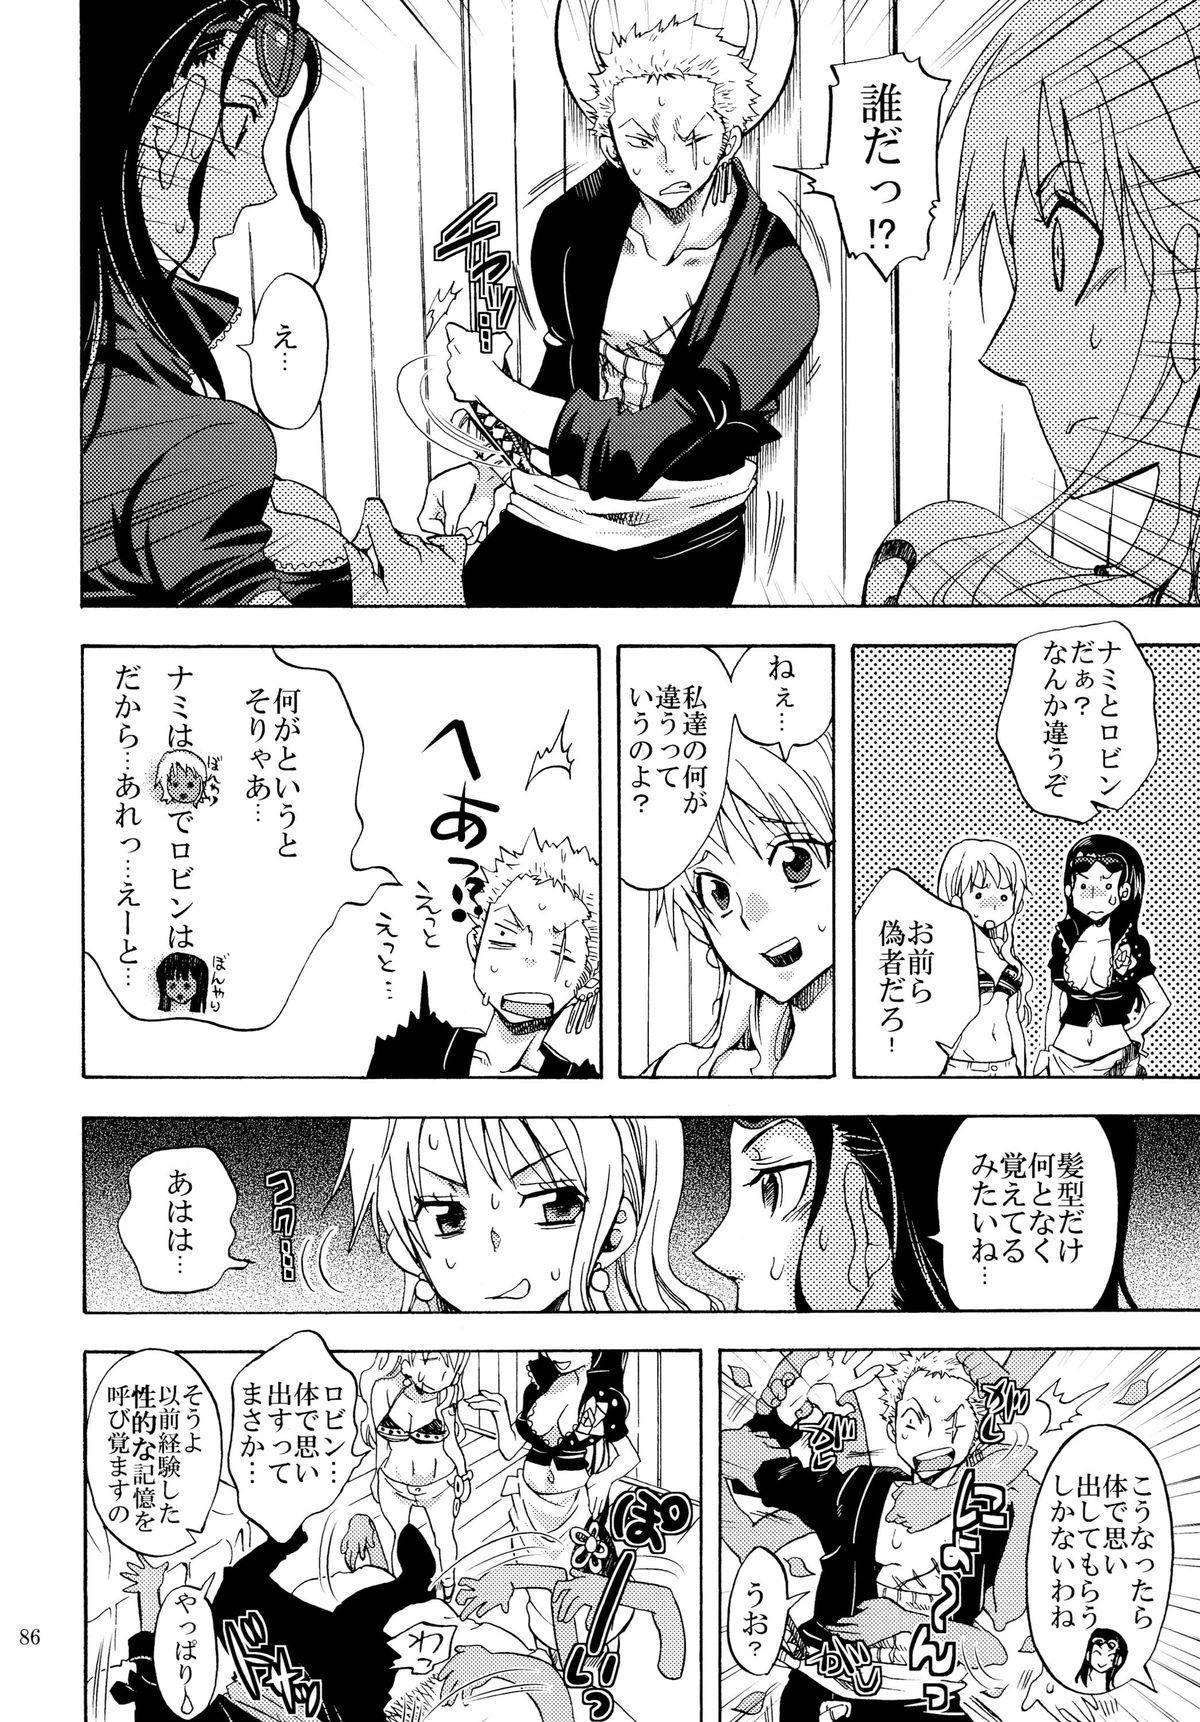 Zoro-Nami ★ Sairoku 85